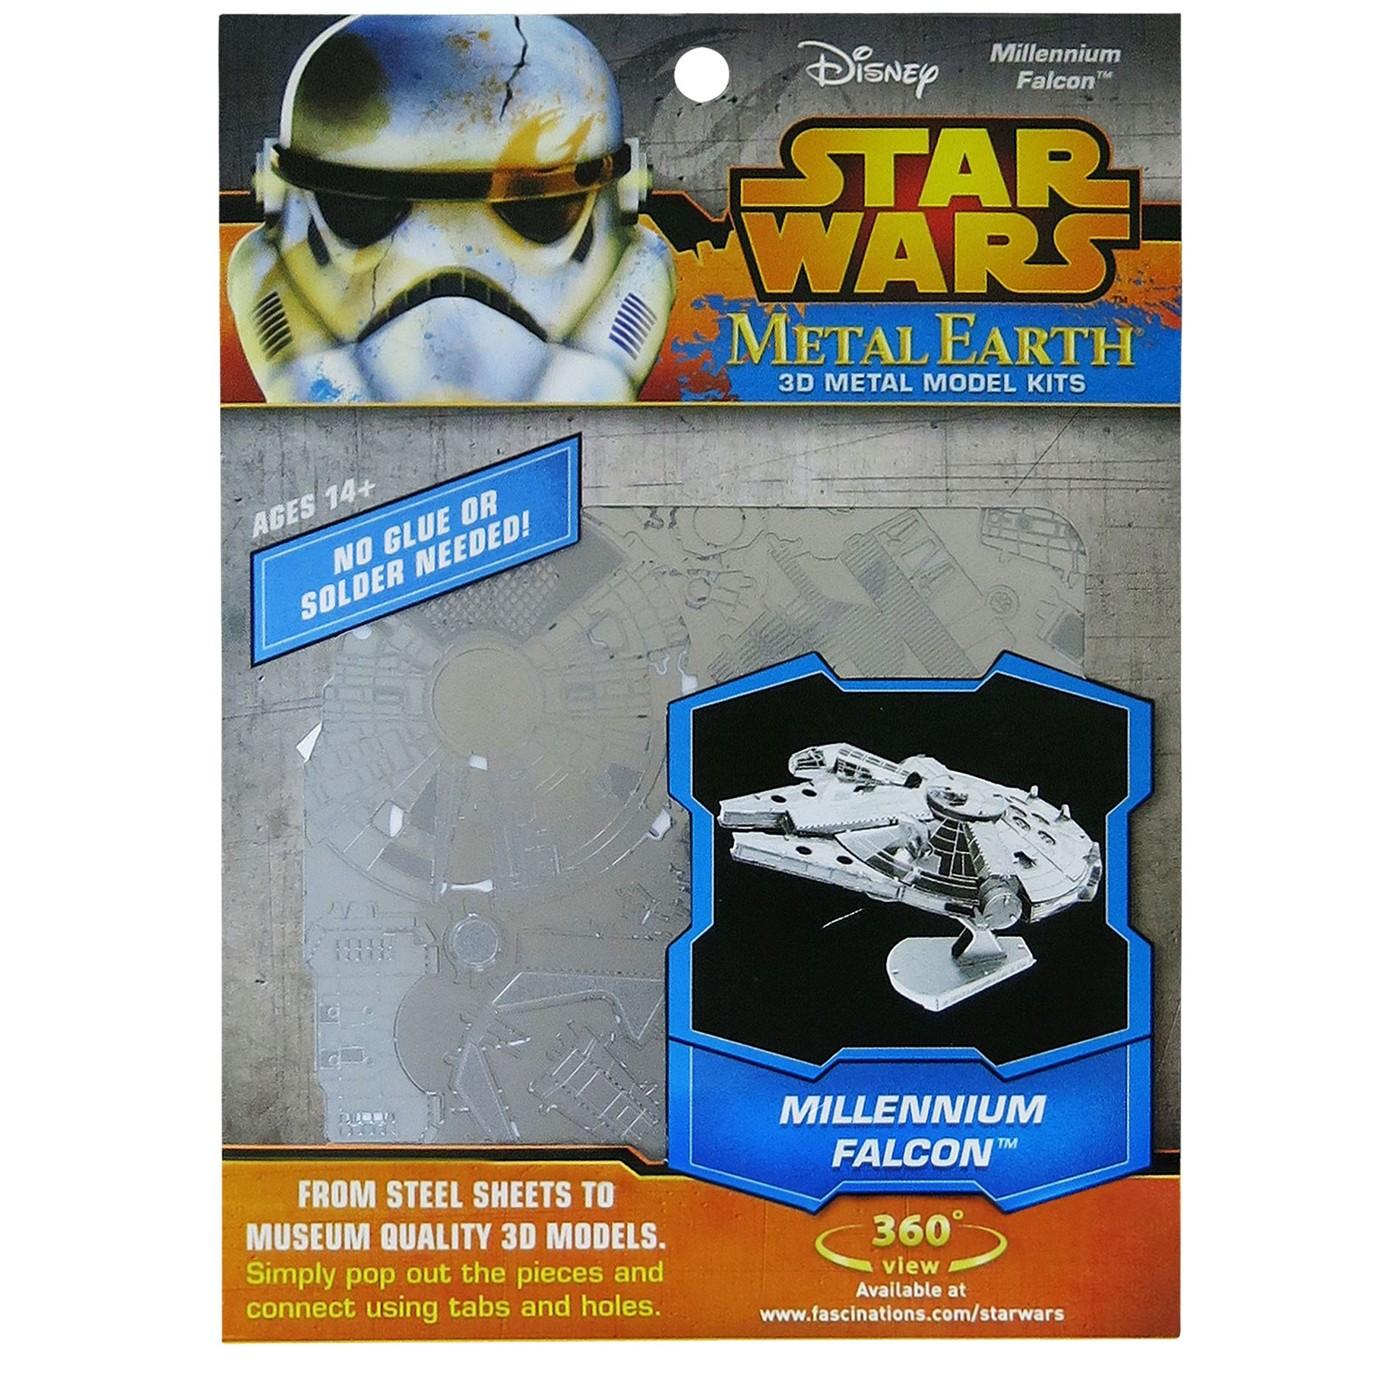 Star Wars Millennium Falcon Metal Earth Model Kit